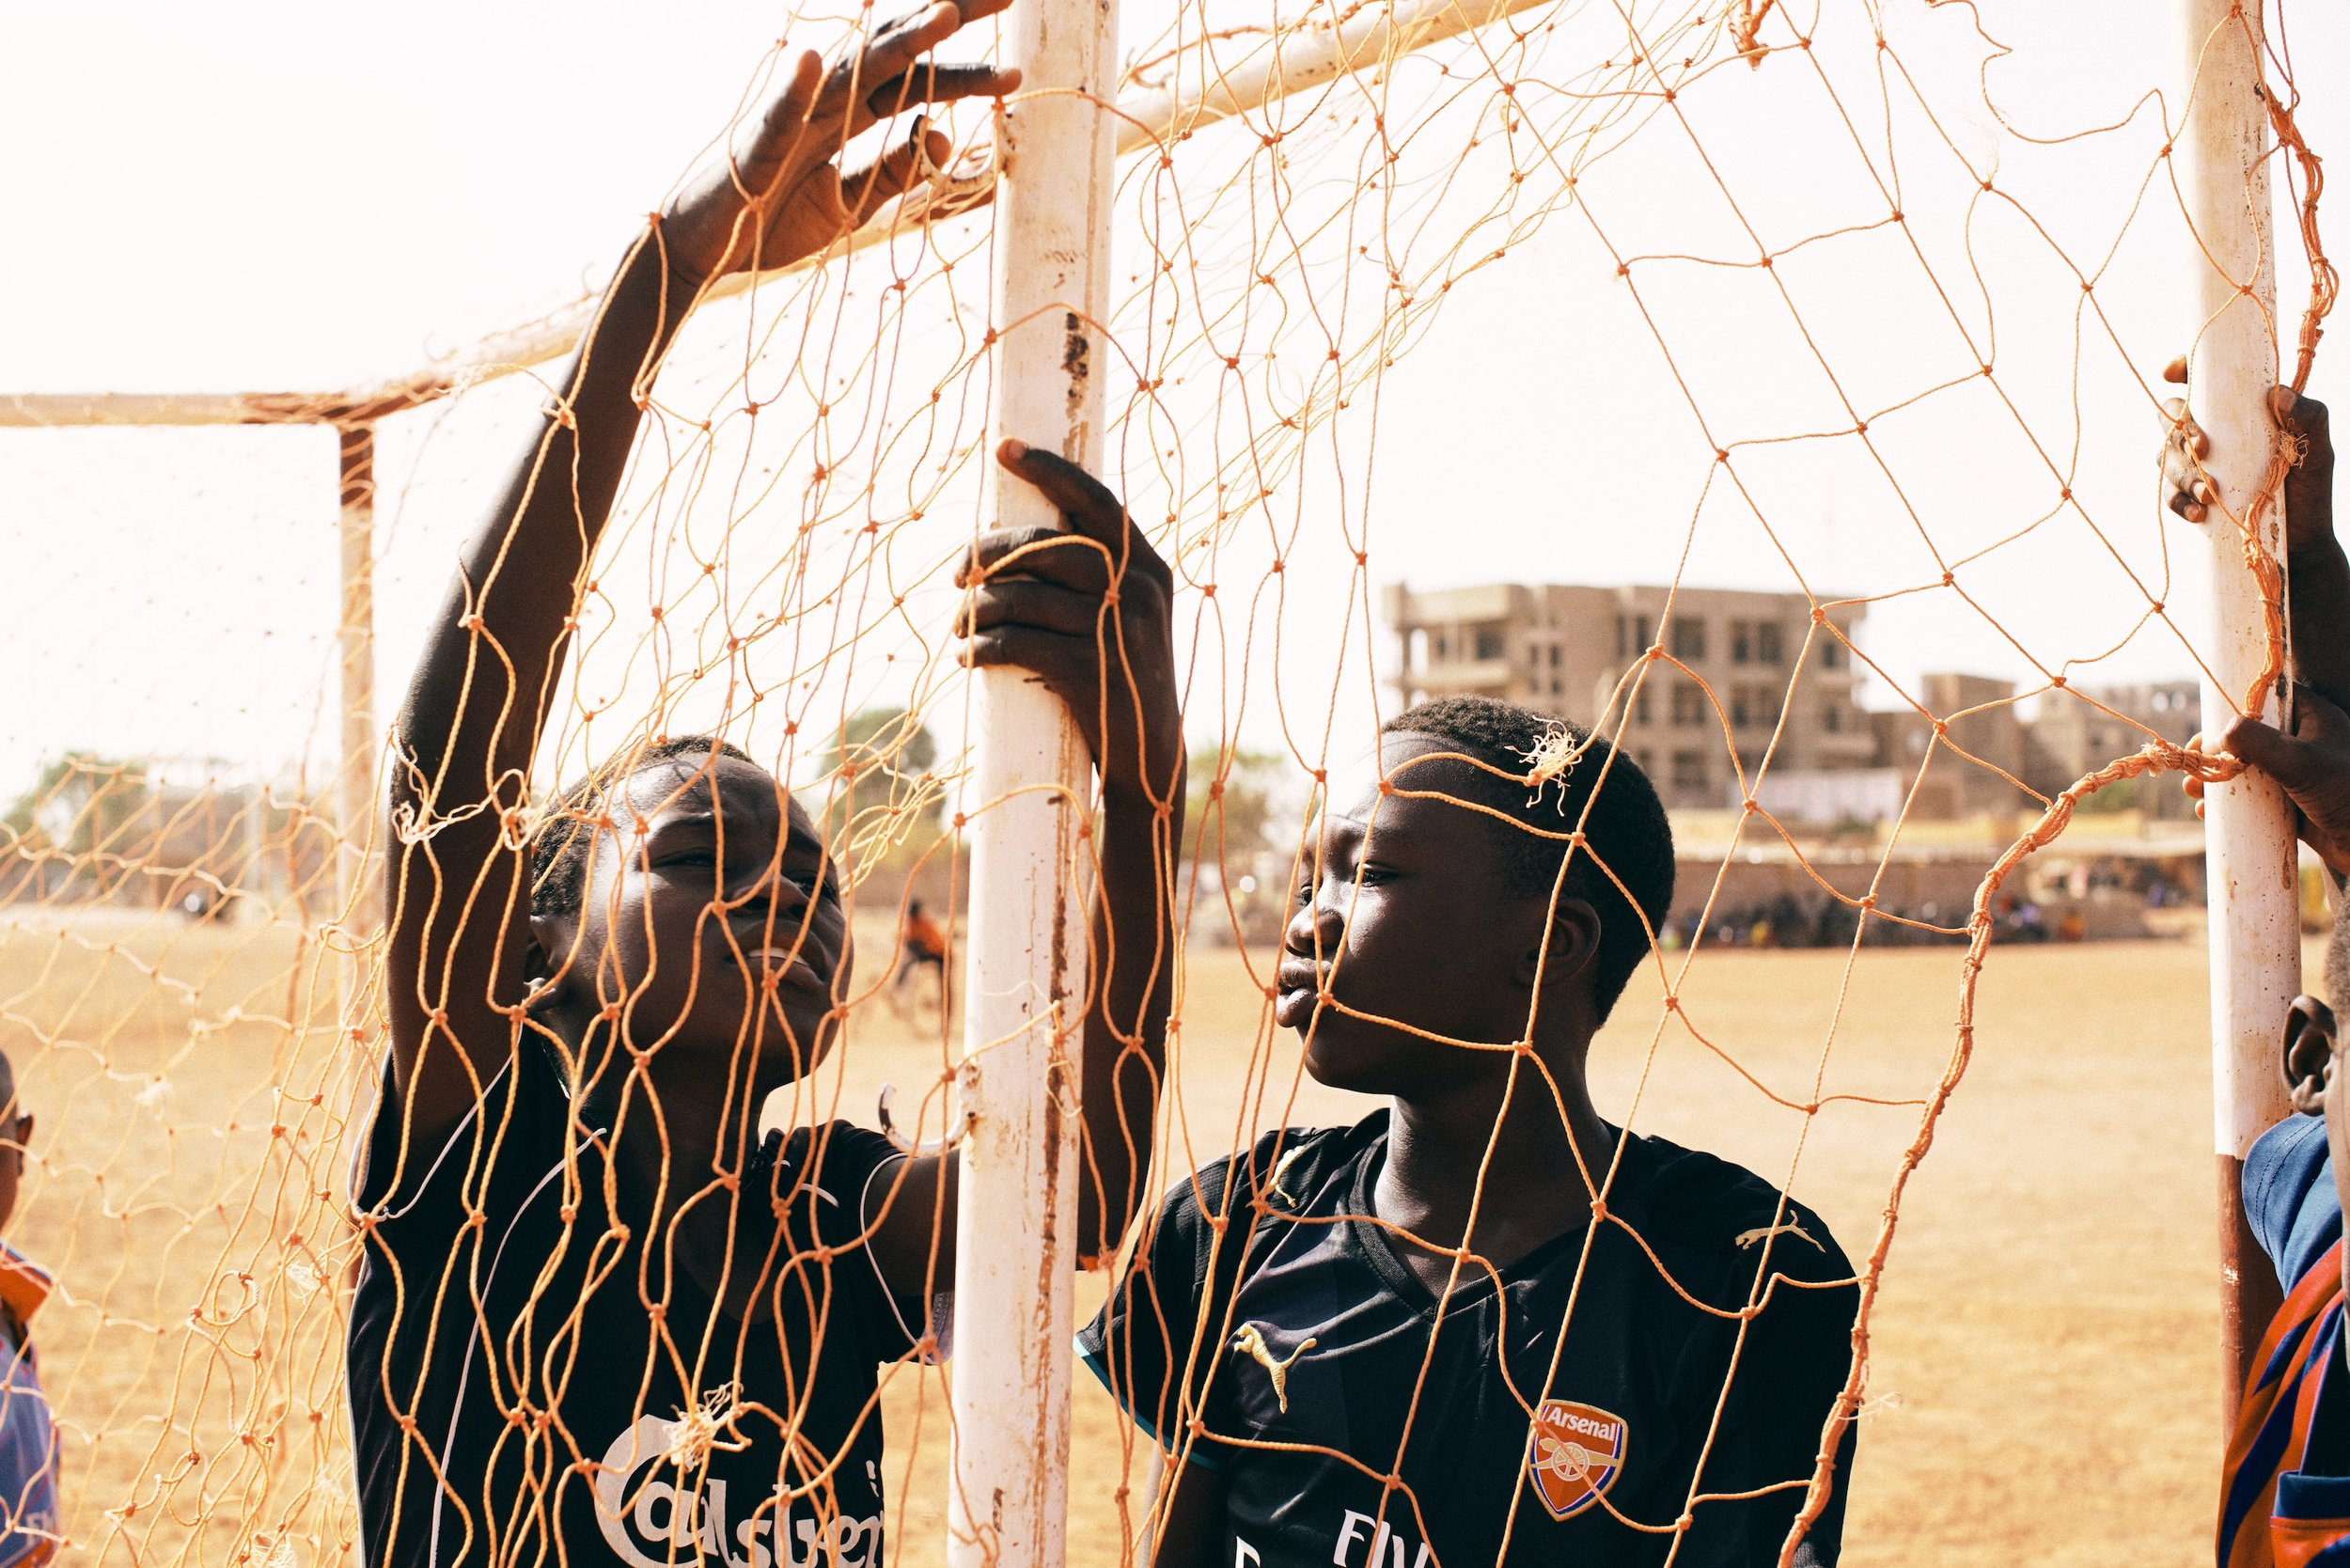 Stockdale_Ouagadougou18.jpg